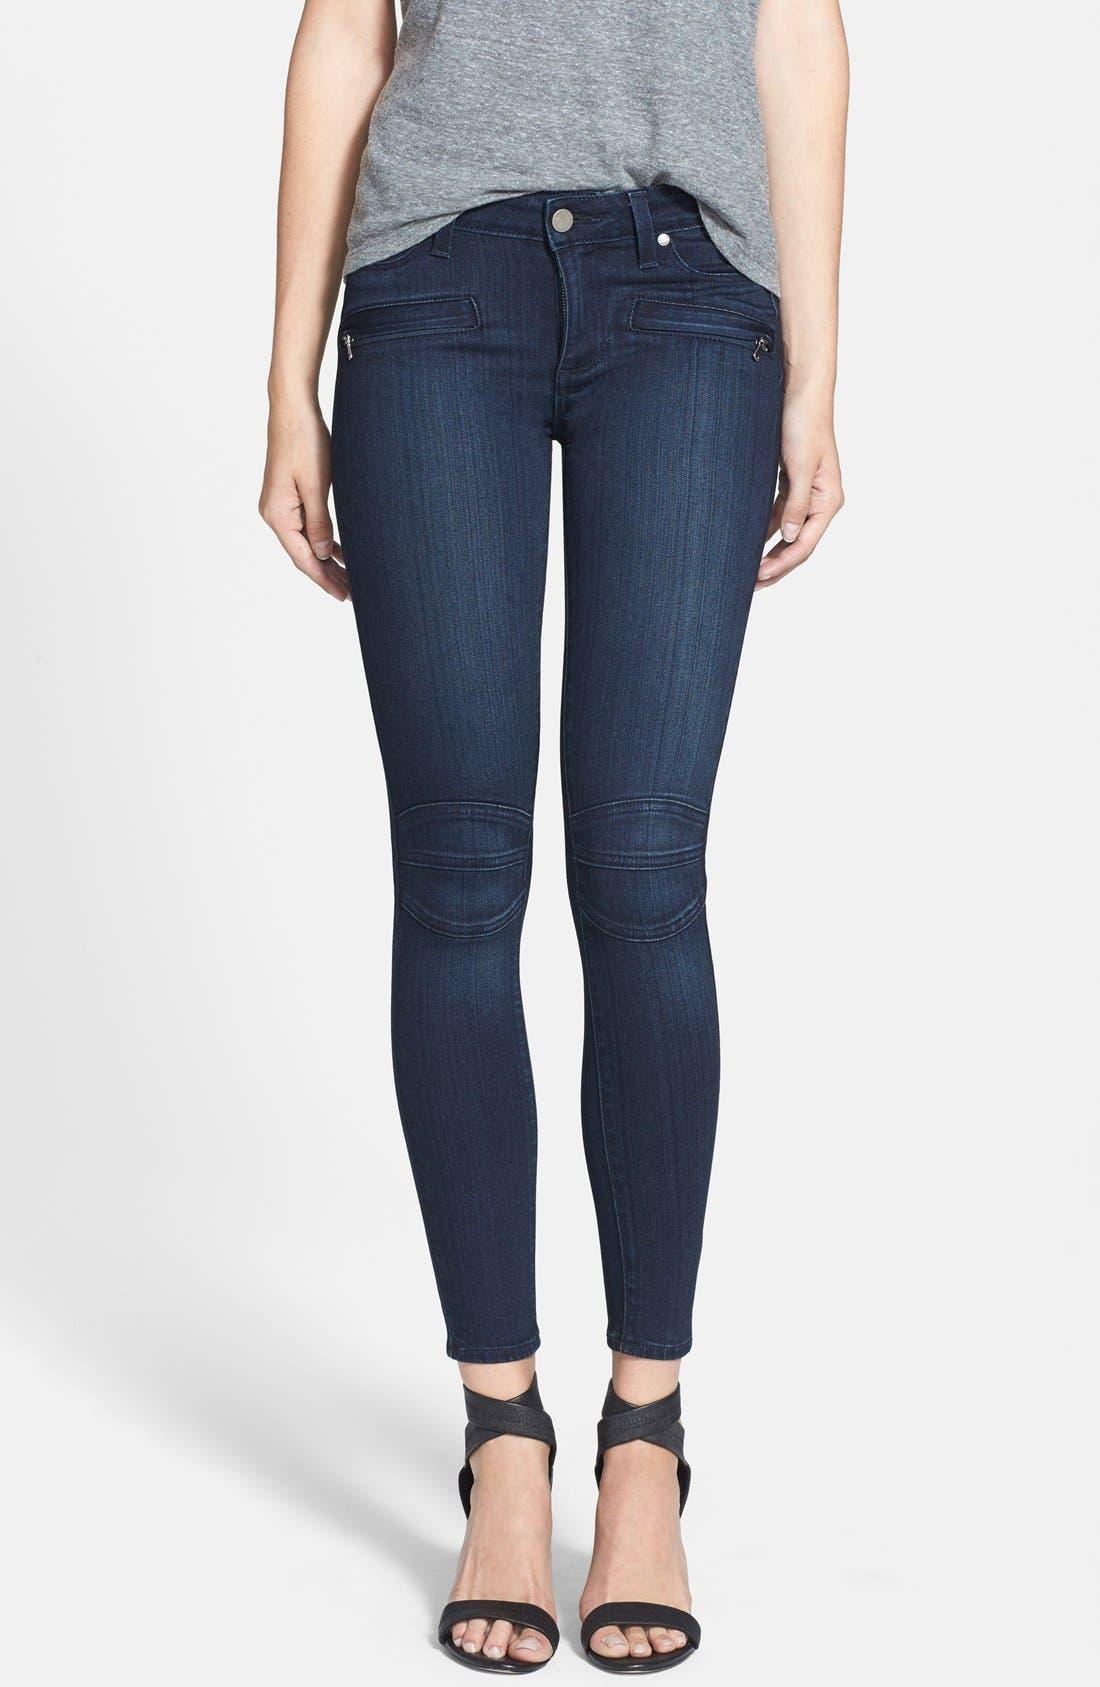 Alternate Image 1 Selected - Paige Denim 'Ollie' Ultra Skinny Jeans (Midlake No Whiskers)